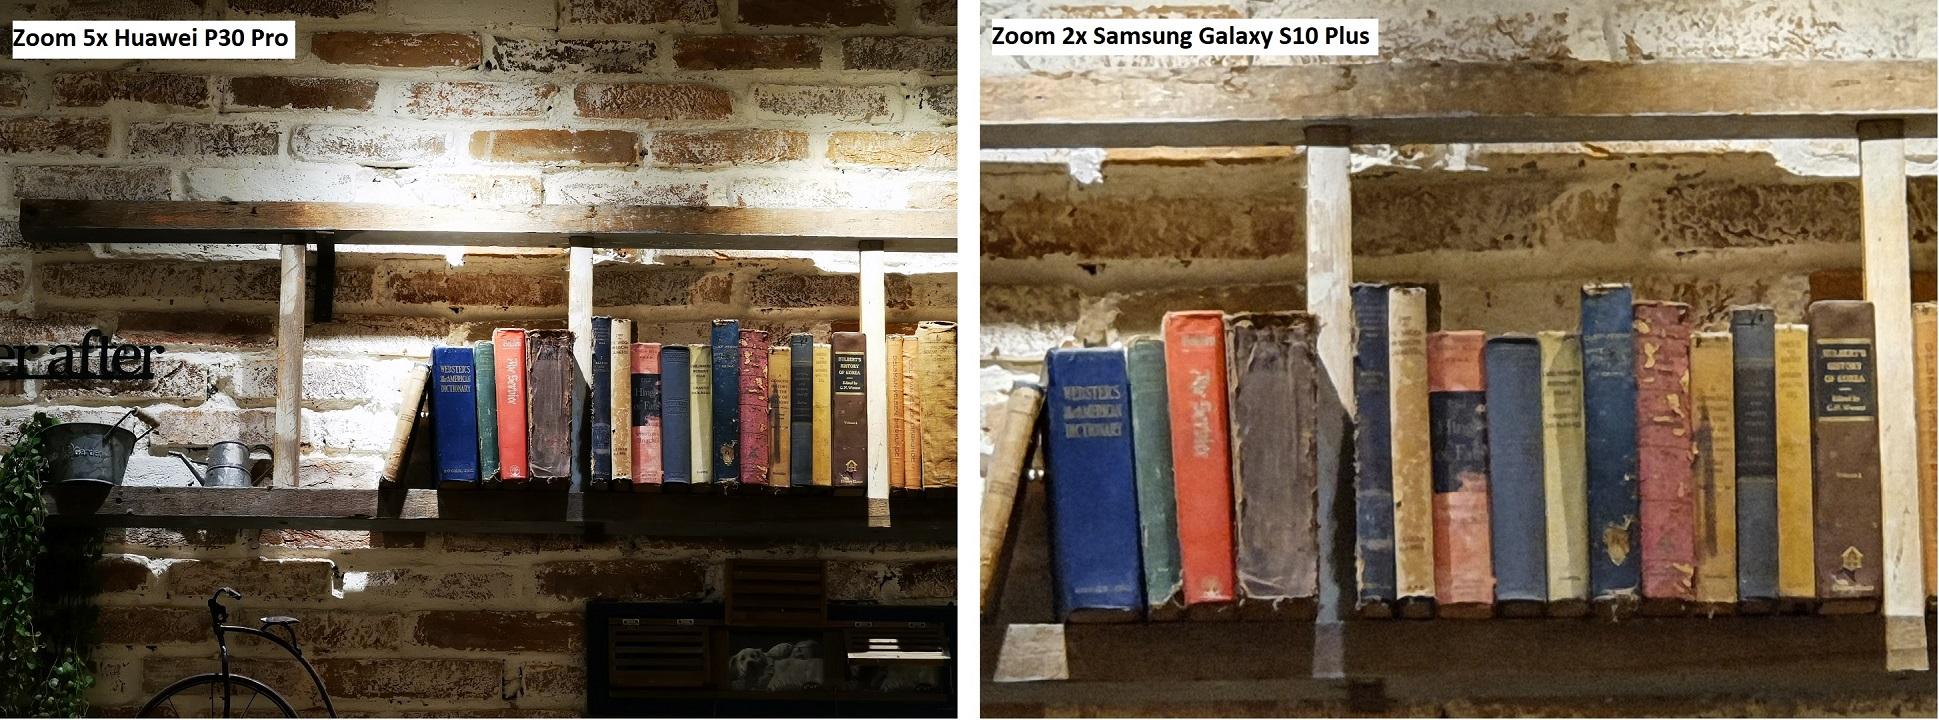 Adu Kemampuan Huawei P30 Pro dan Samsung Galaxy S10 Plus